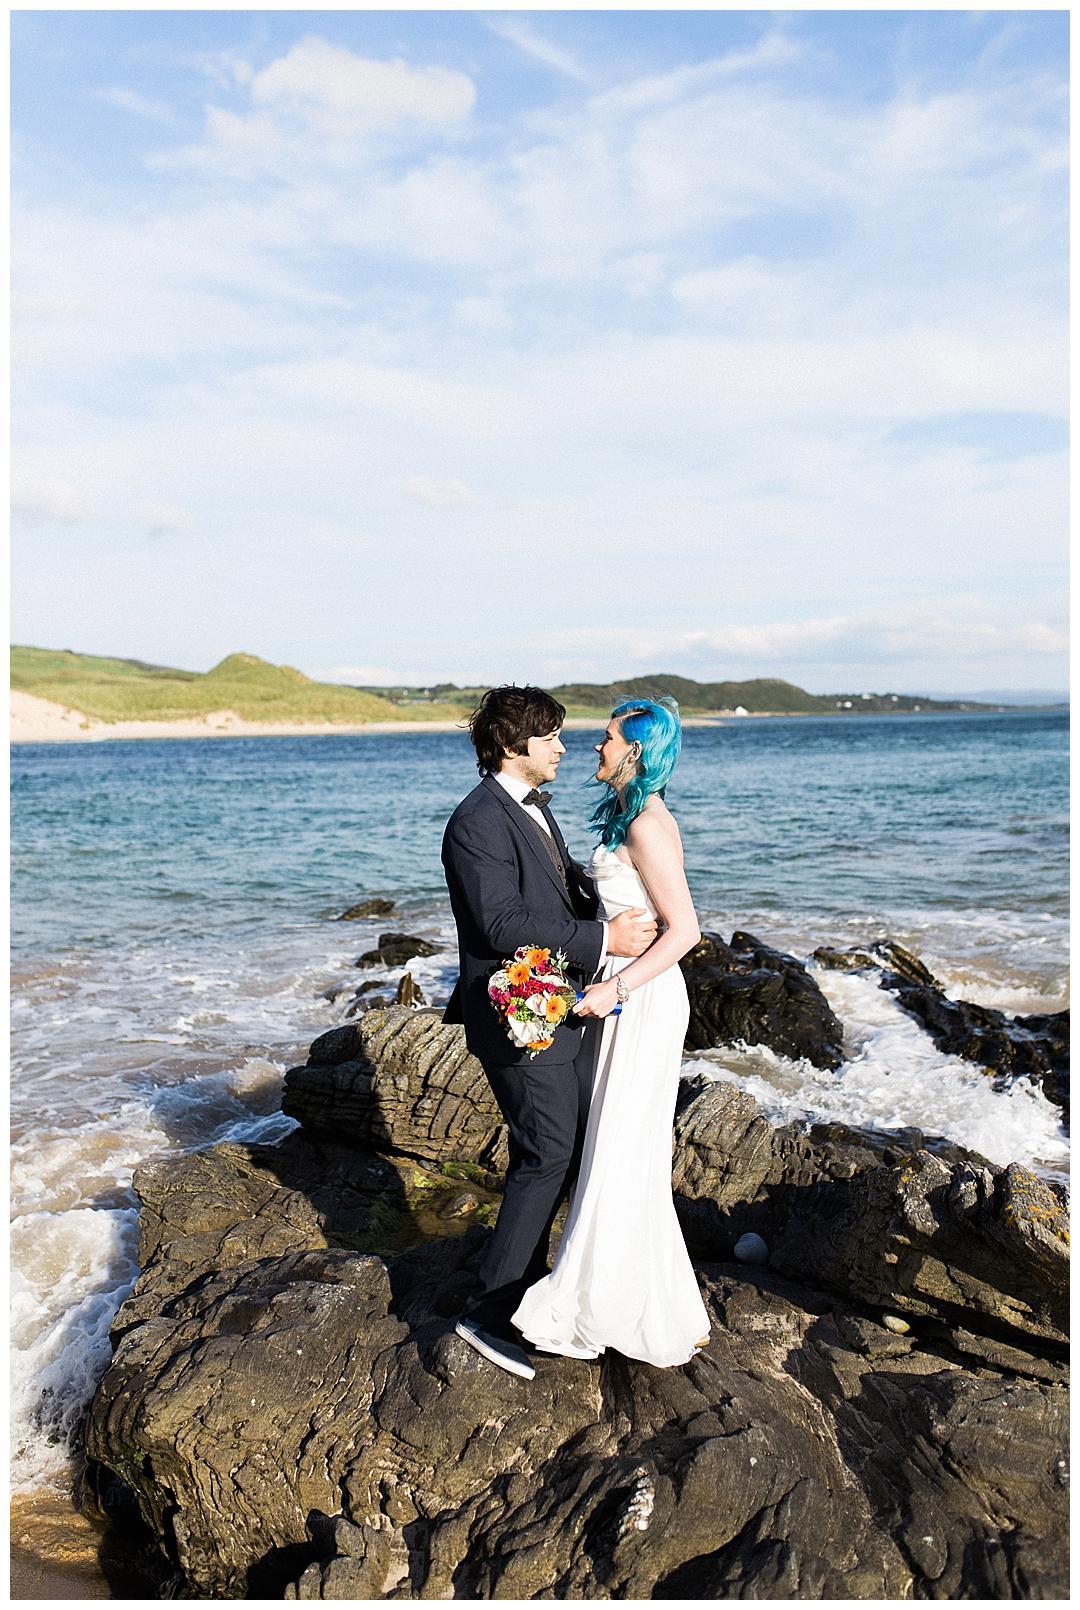 We_can _be_Heroes_alternative_wedding_photographer_Ireland_0061